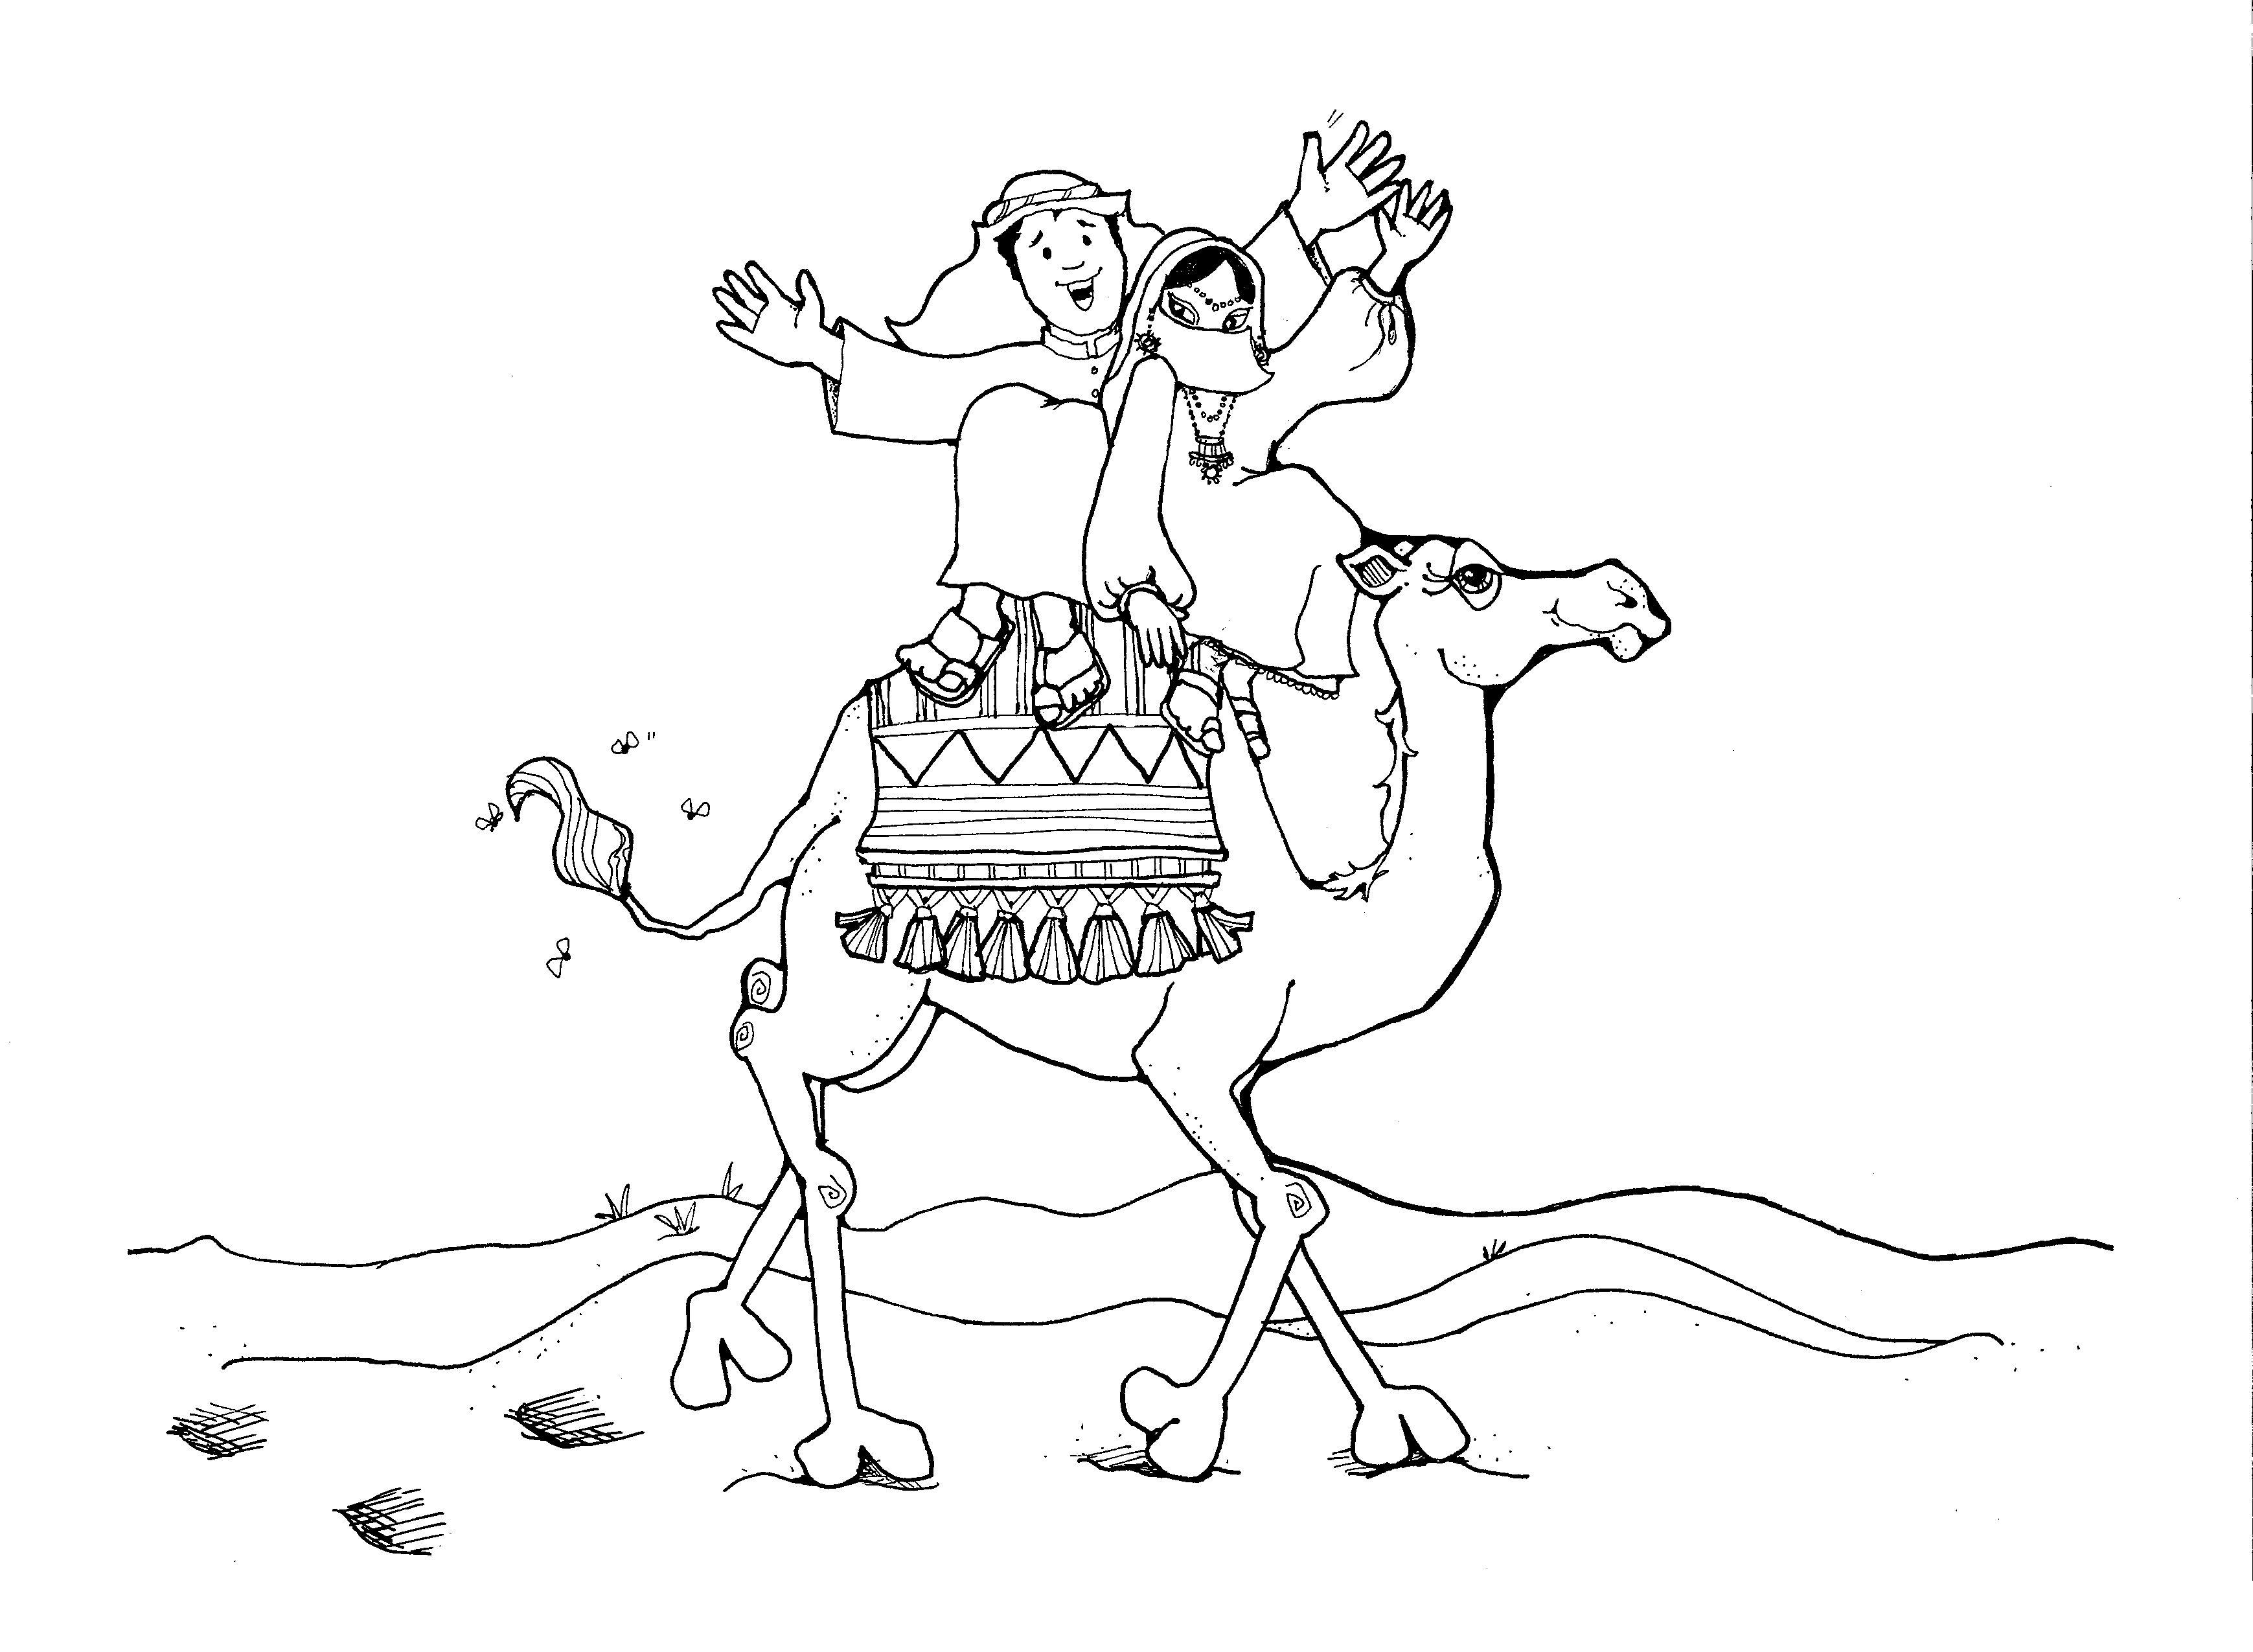 Pin Op Thema Kamelen Kleuters Camel Theme Preschool Camel Theme Maternelle